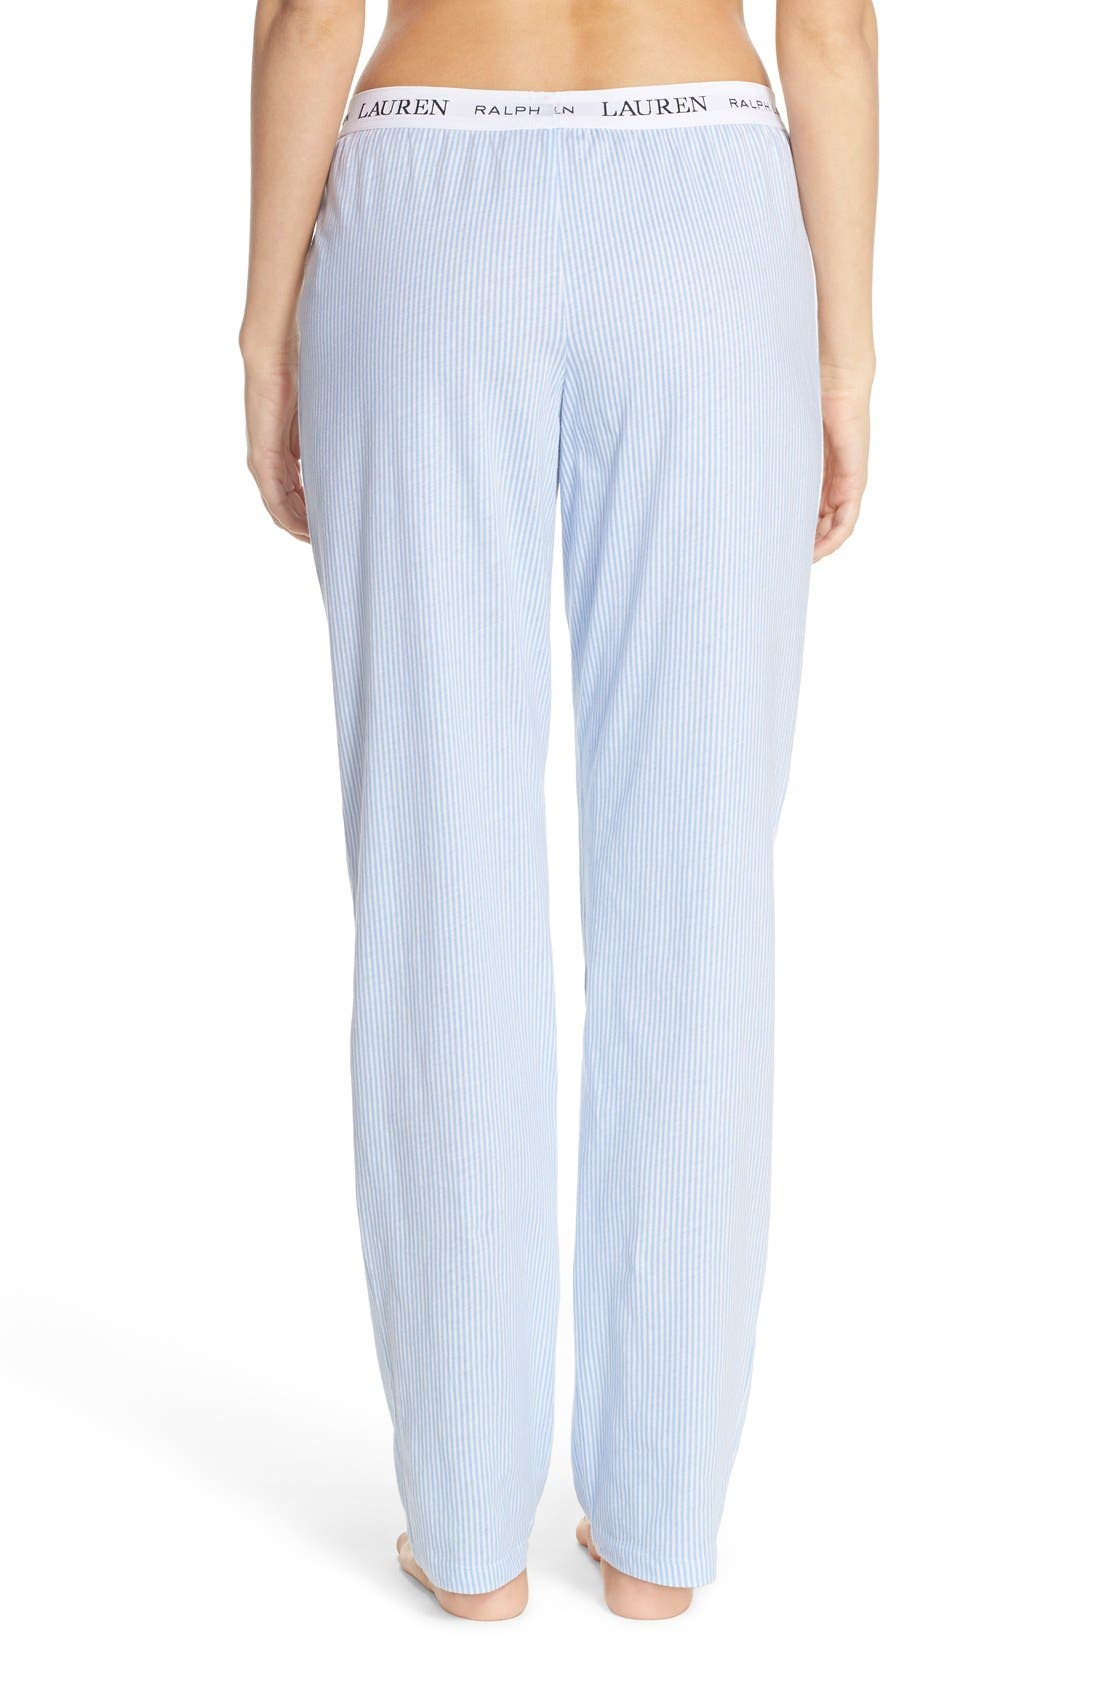 LAUREN RALPH LAUREN, Logo Waistband Lounge Pants, Alternate thumbnail 4, color, STRIPE PALE BLUE/ WHITE